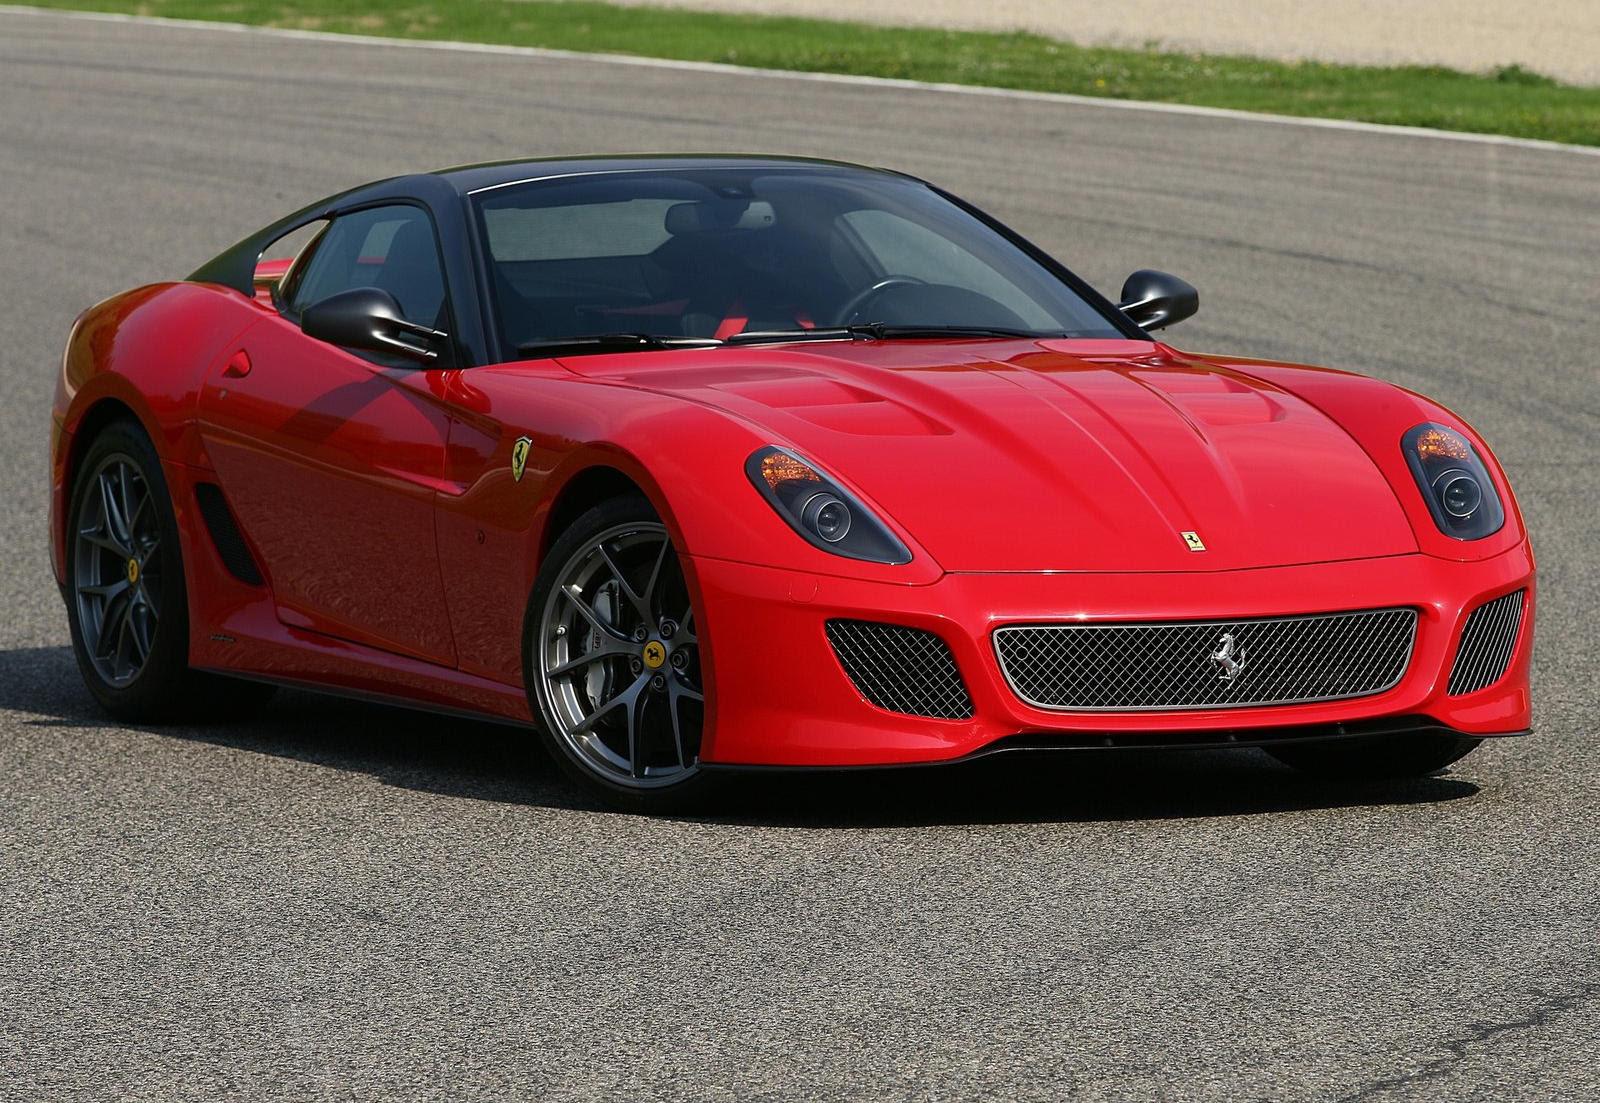 Ferrari 599 Gto Review Trims Specs Price New Interior Features Exterior Design And Specifications Carbuzz